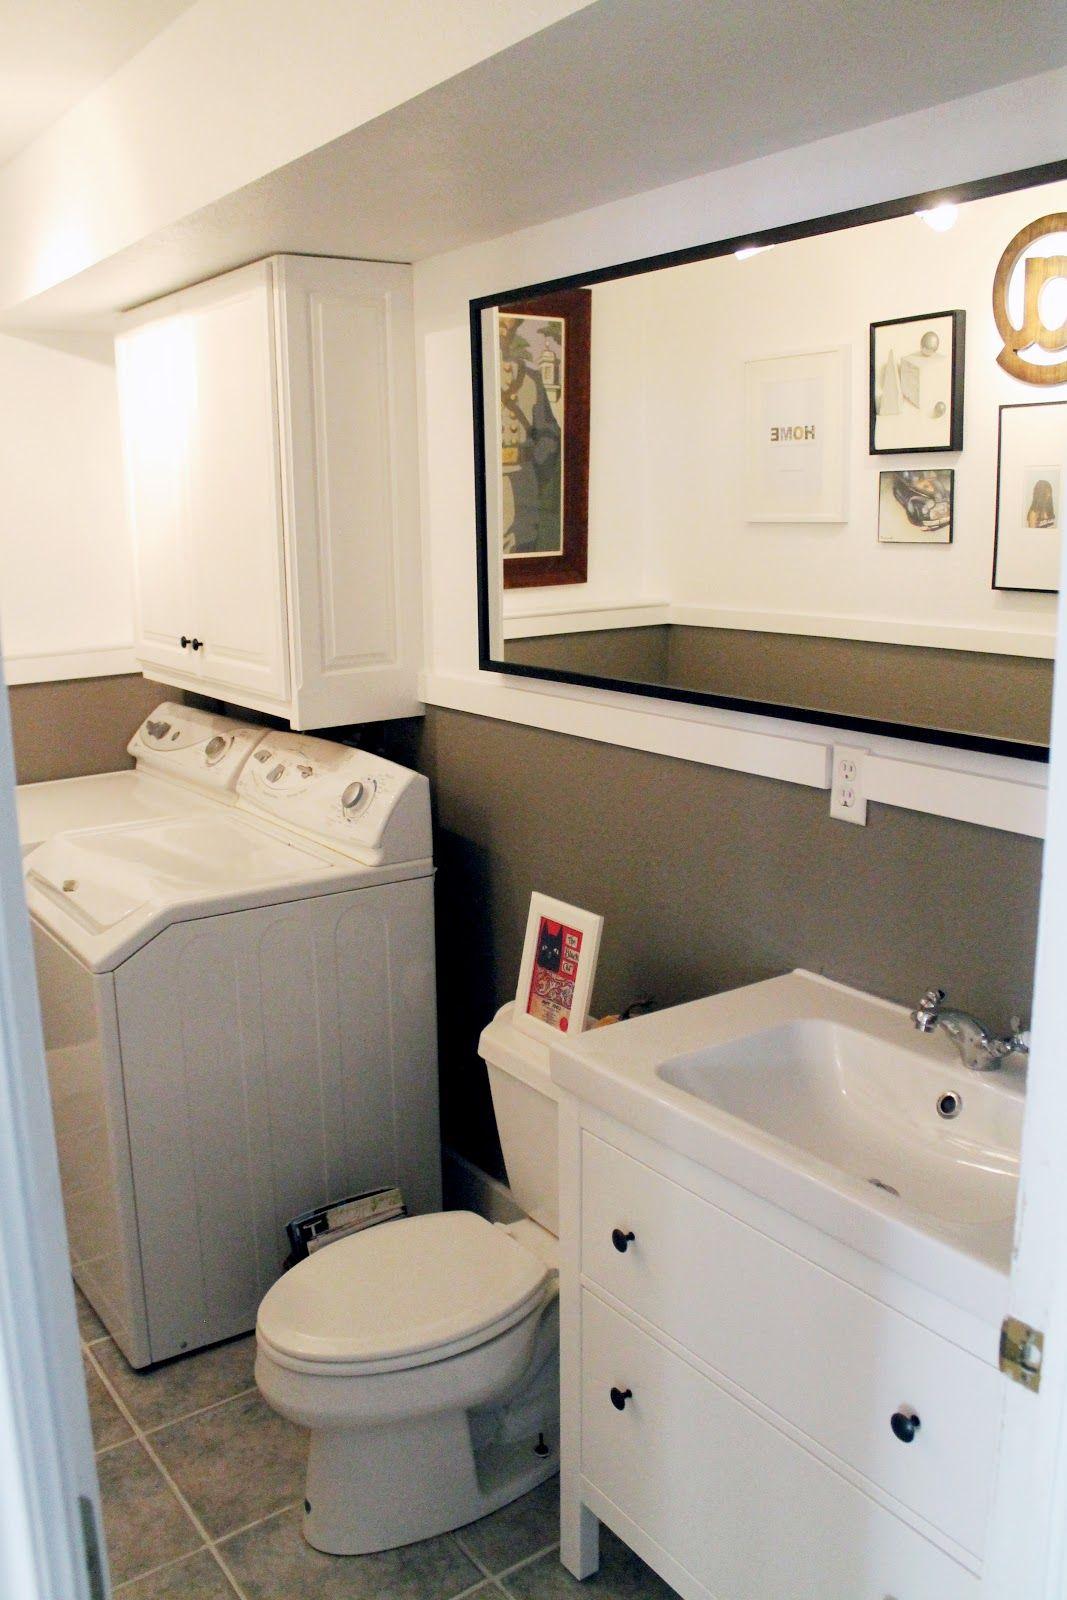 Laundry Bathroom Ideas Gorgeous Img_8459Jpg 1067×1600 Pixels  Bathroom  Pinterest  Laundry Design Inspiration